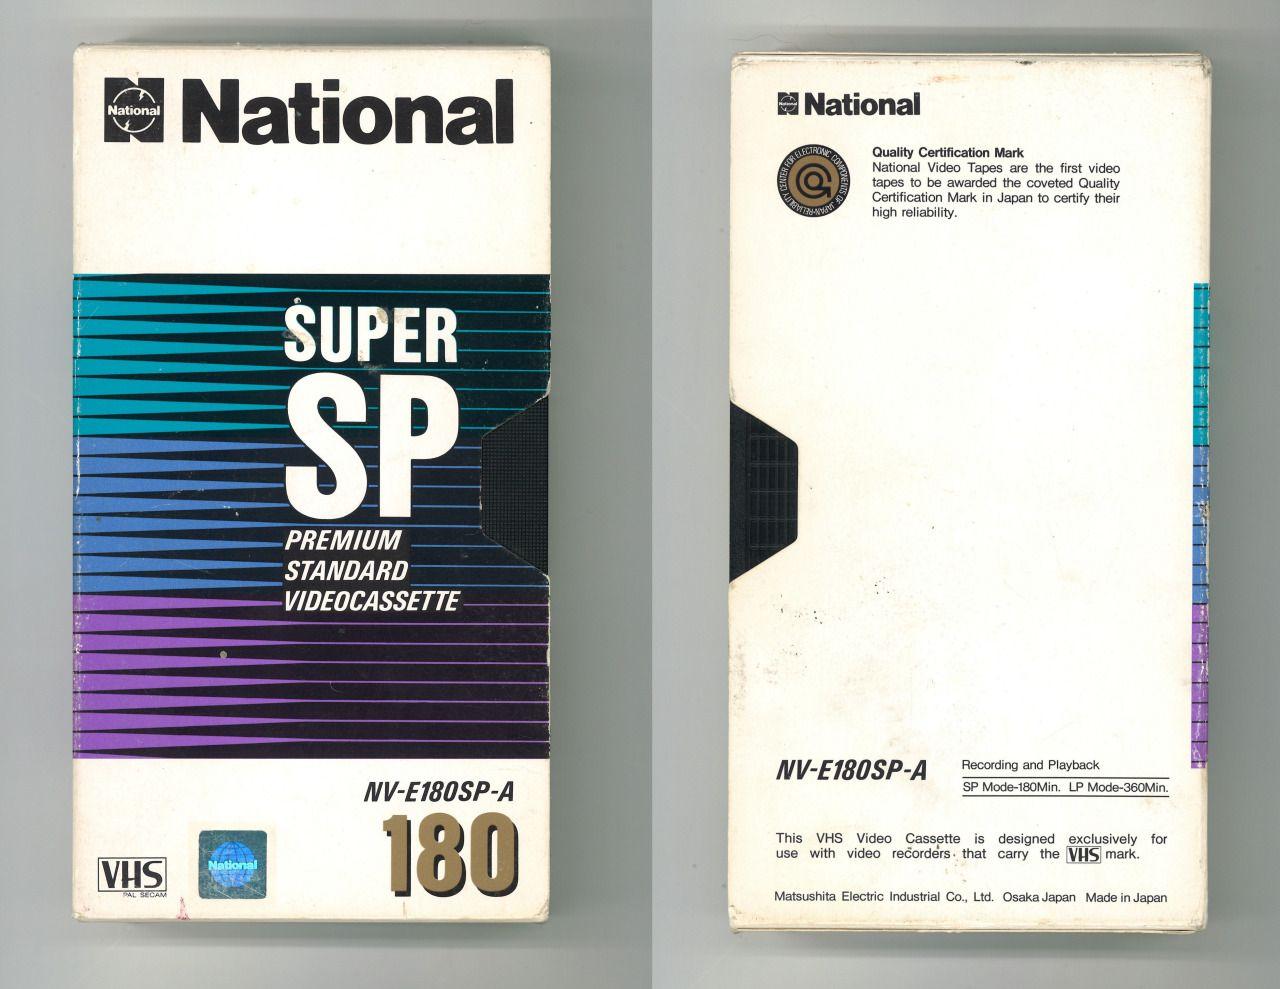 Premium Standard Videocassette